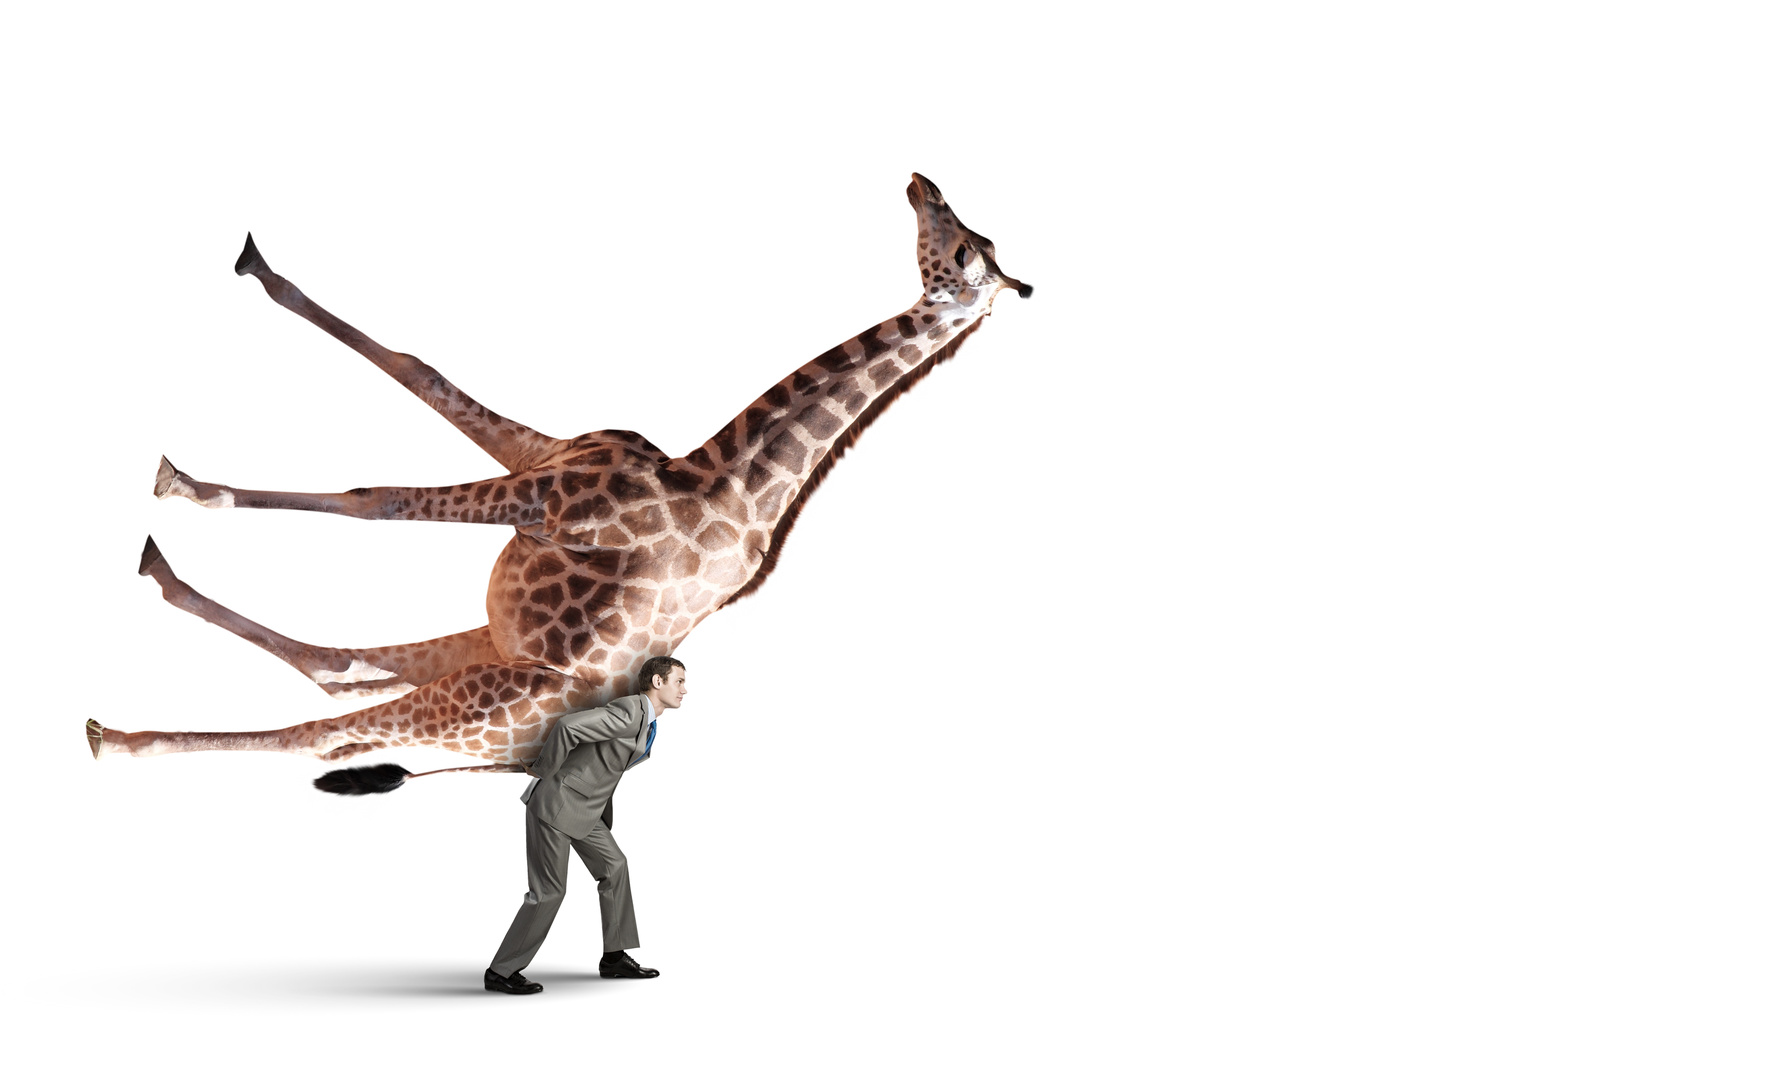 Fotolia_75073929_Mann trägt Giraffe